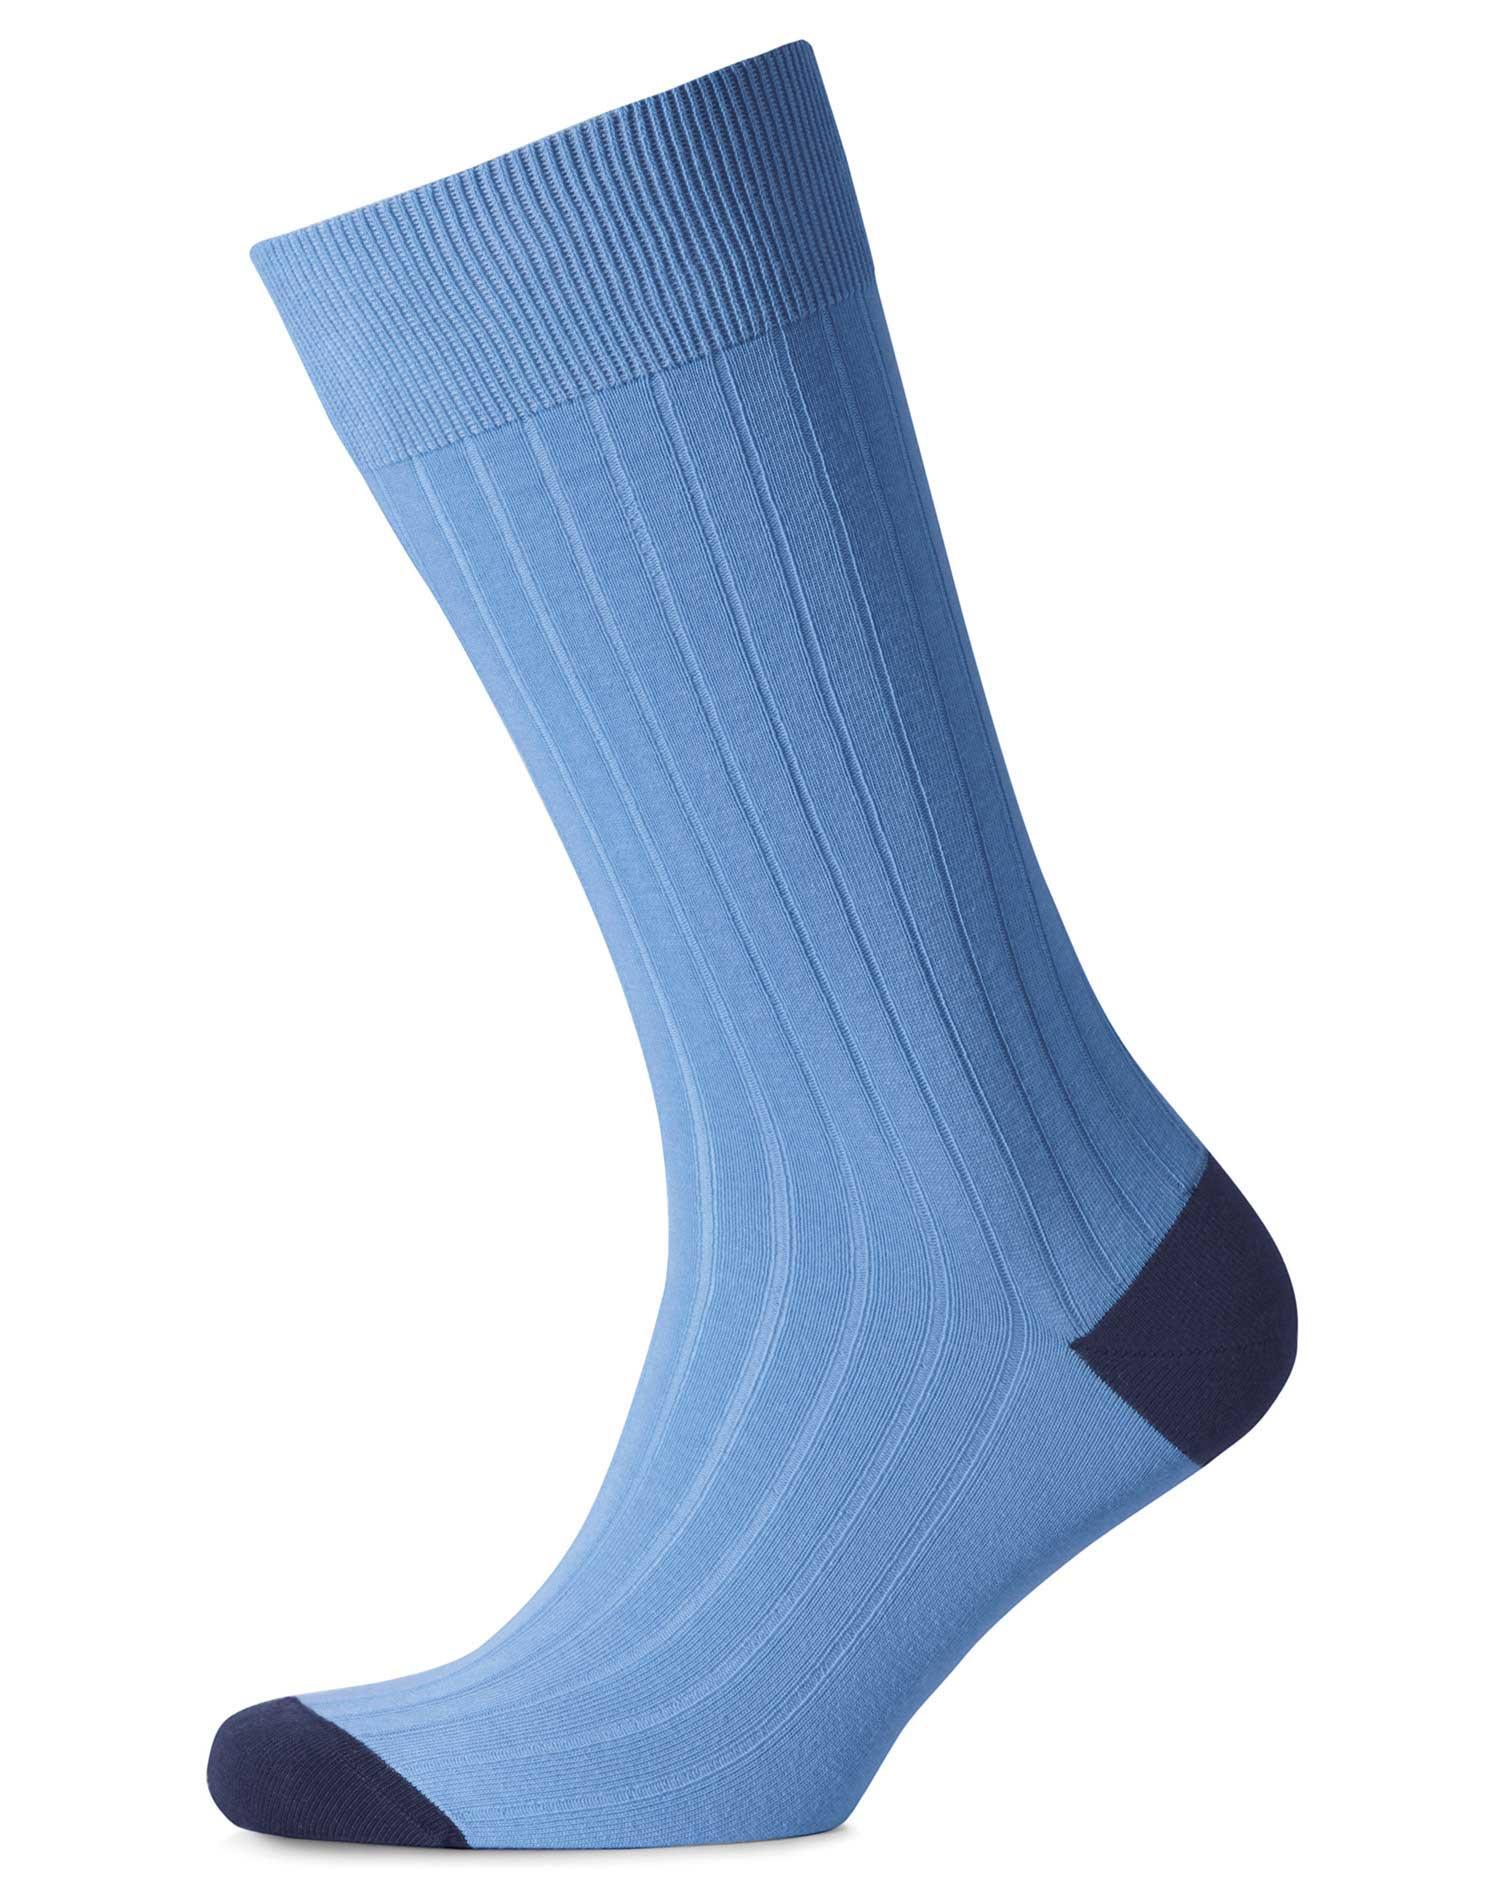 Sky Blue Cotton Rib Socks Size Large by Charles Tyrwhitt